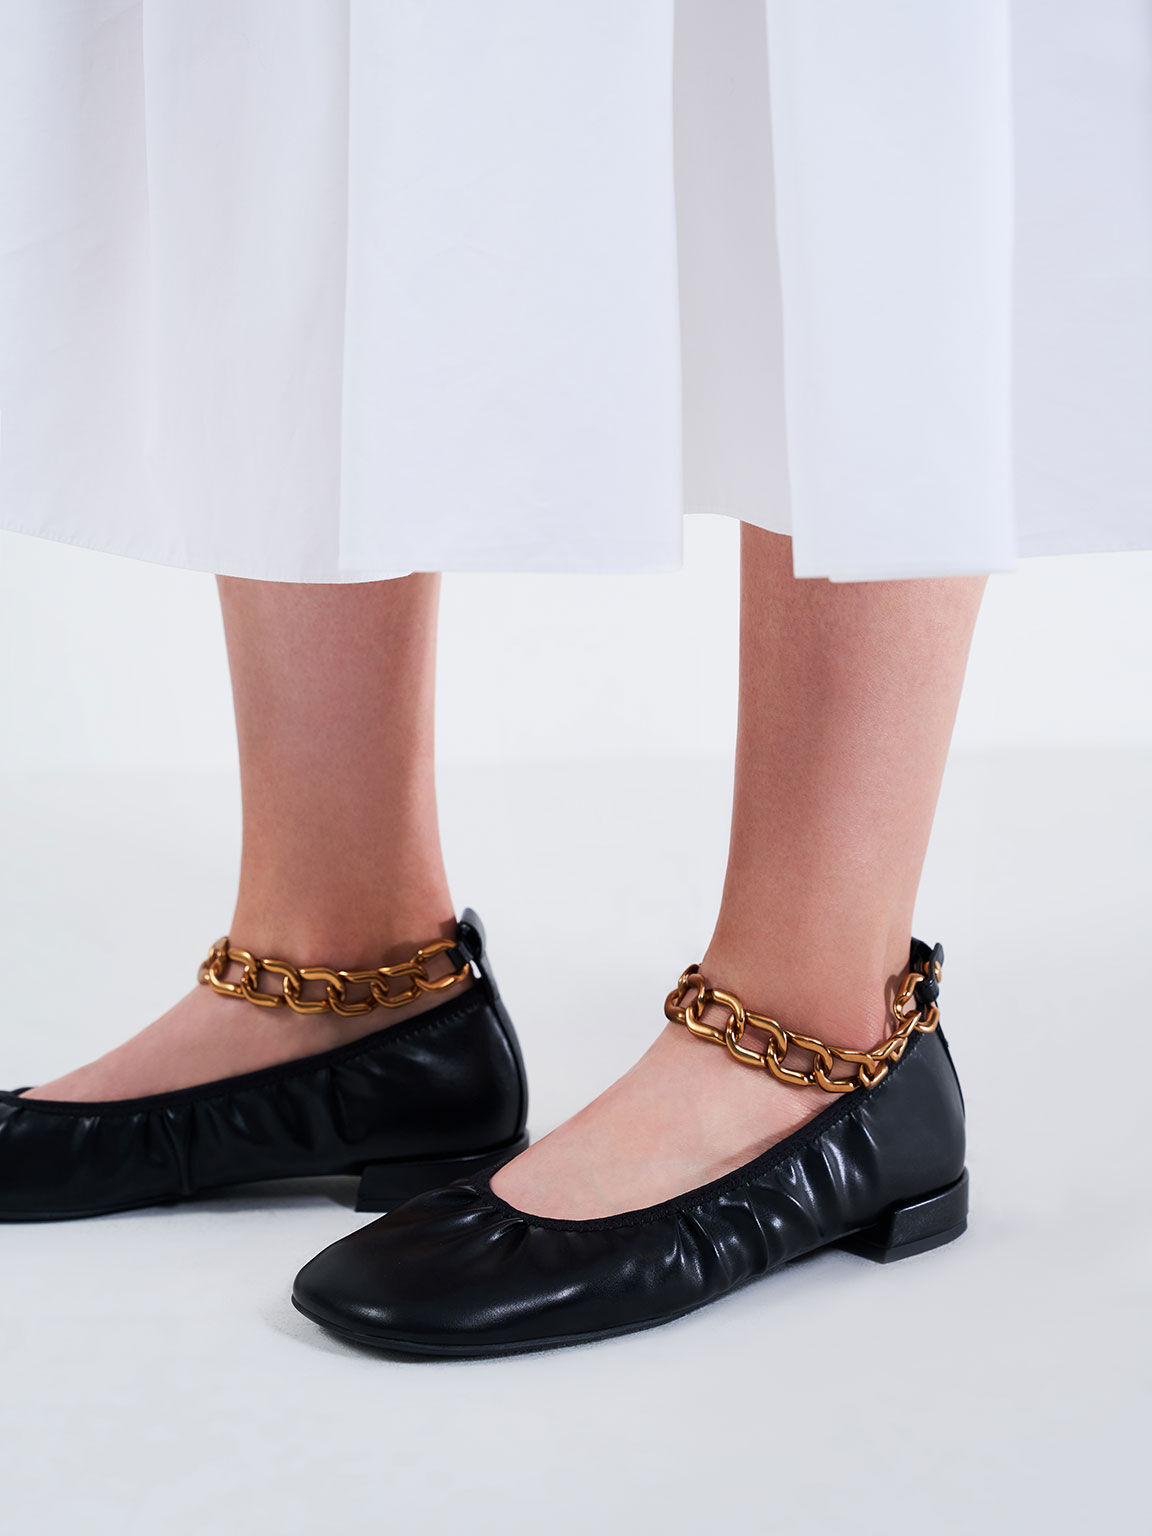 Chunky Chain Ankle Ballerina Flats, Black, hi-res